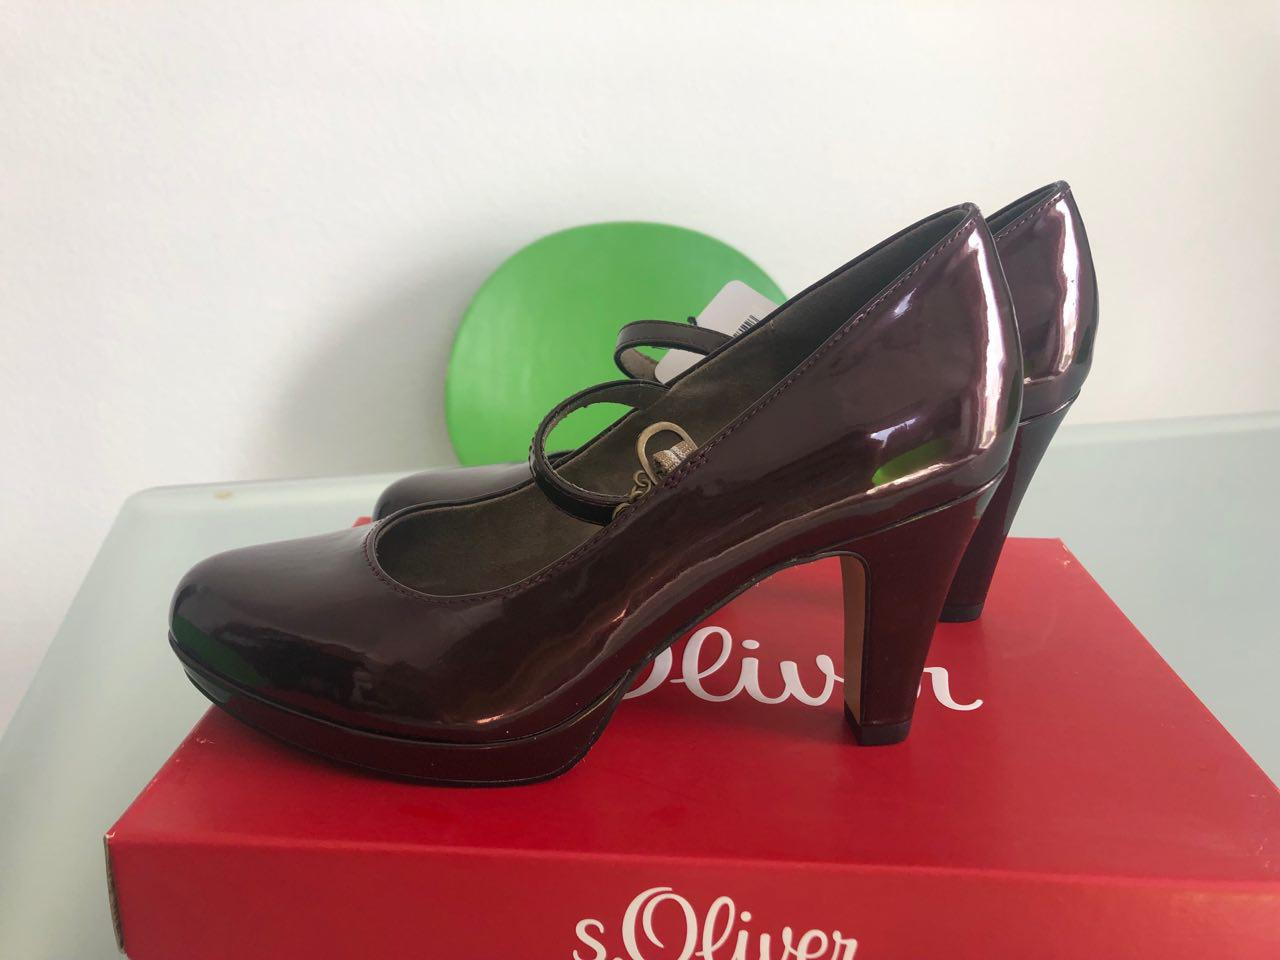 Foto des unpaars Damen Unpaar-Schuhe Pumps S. Oliver li. 37 re. 38 Riemchen Absatz glänzend